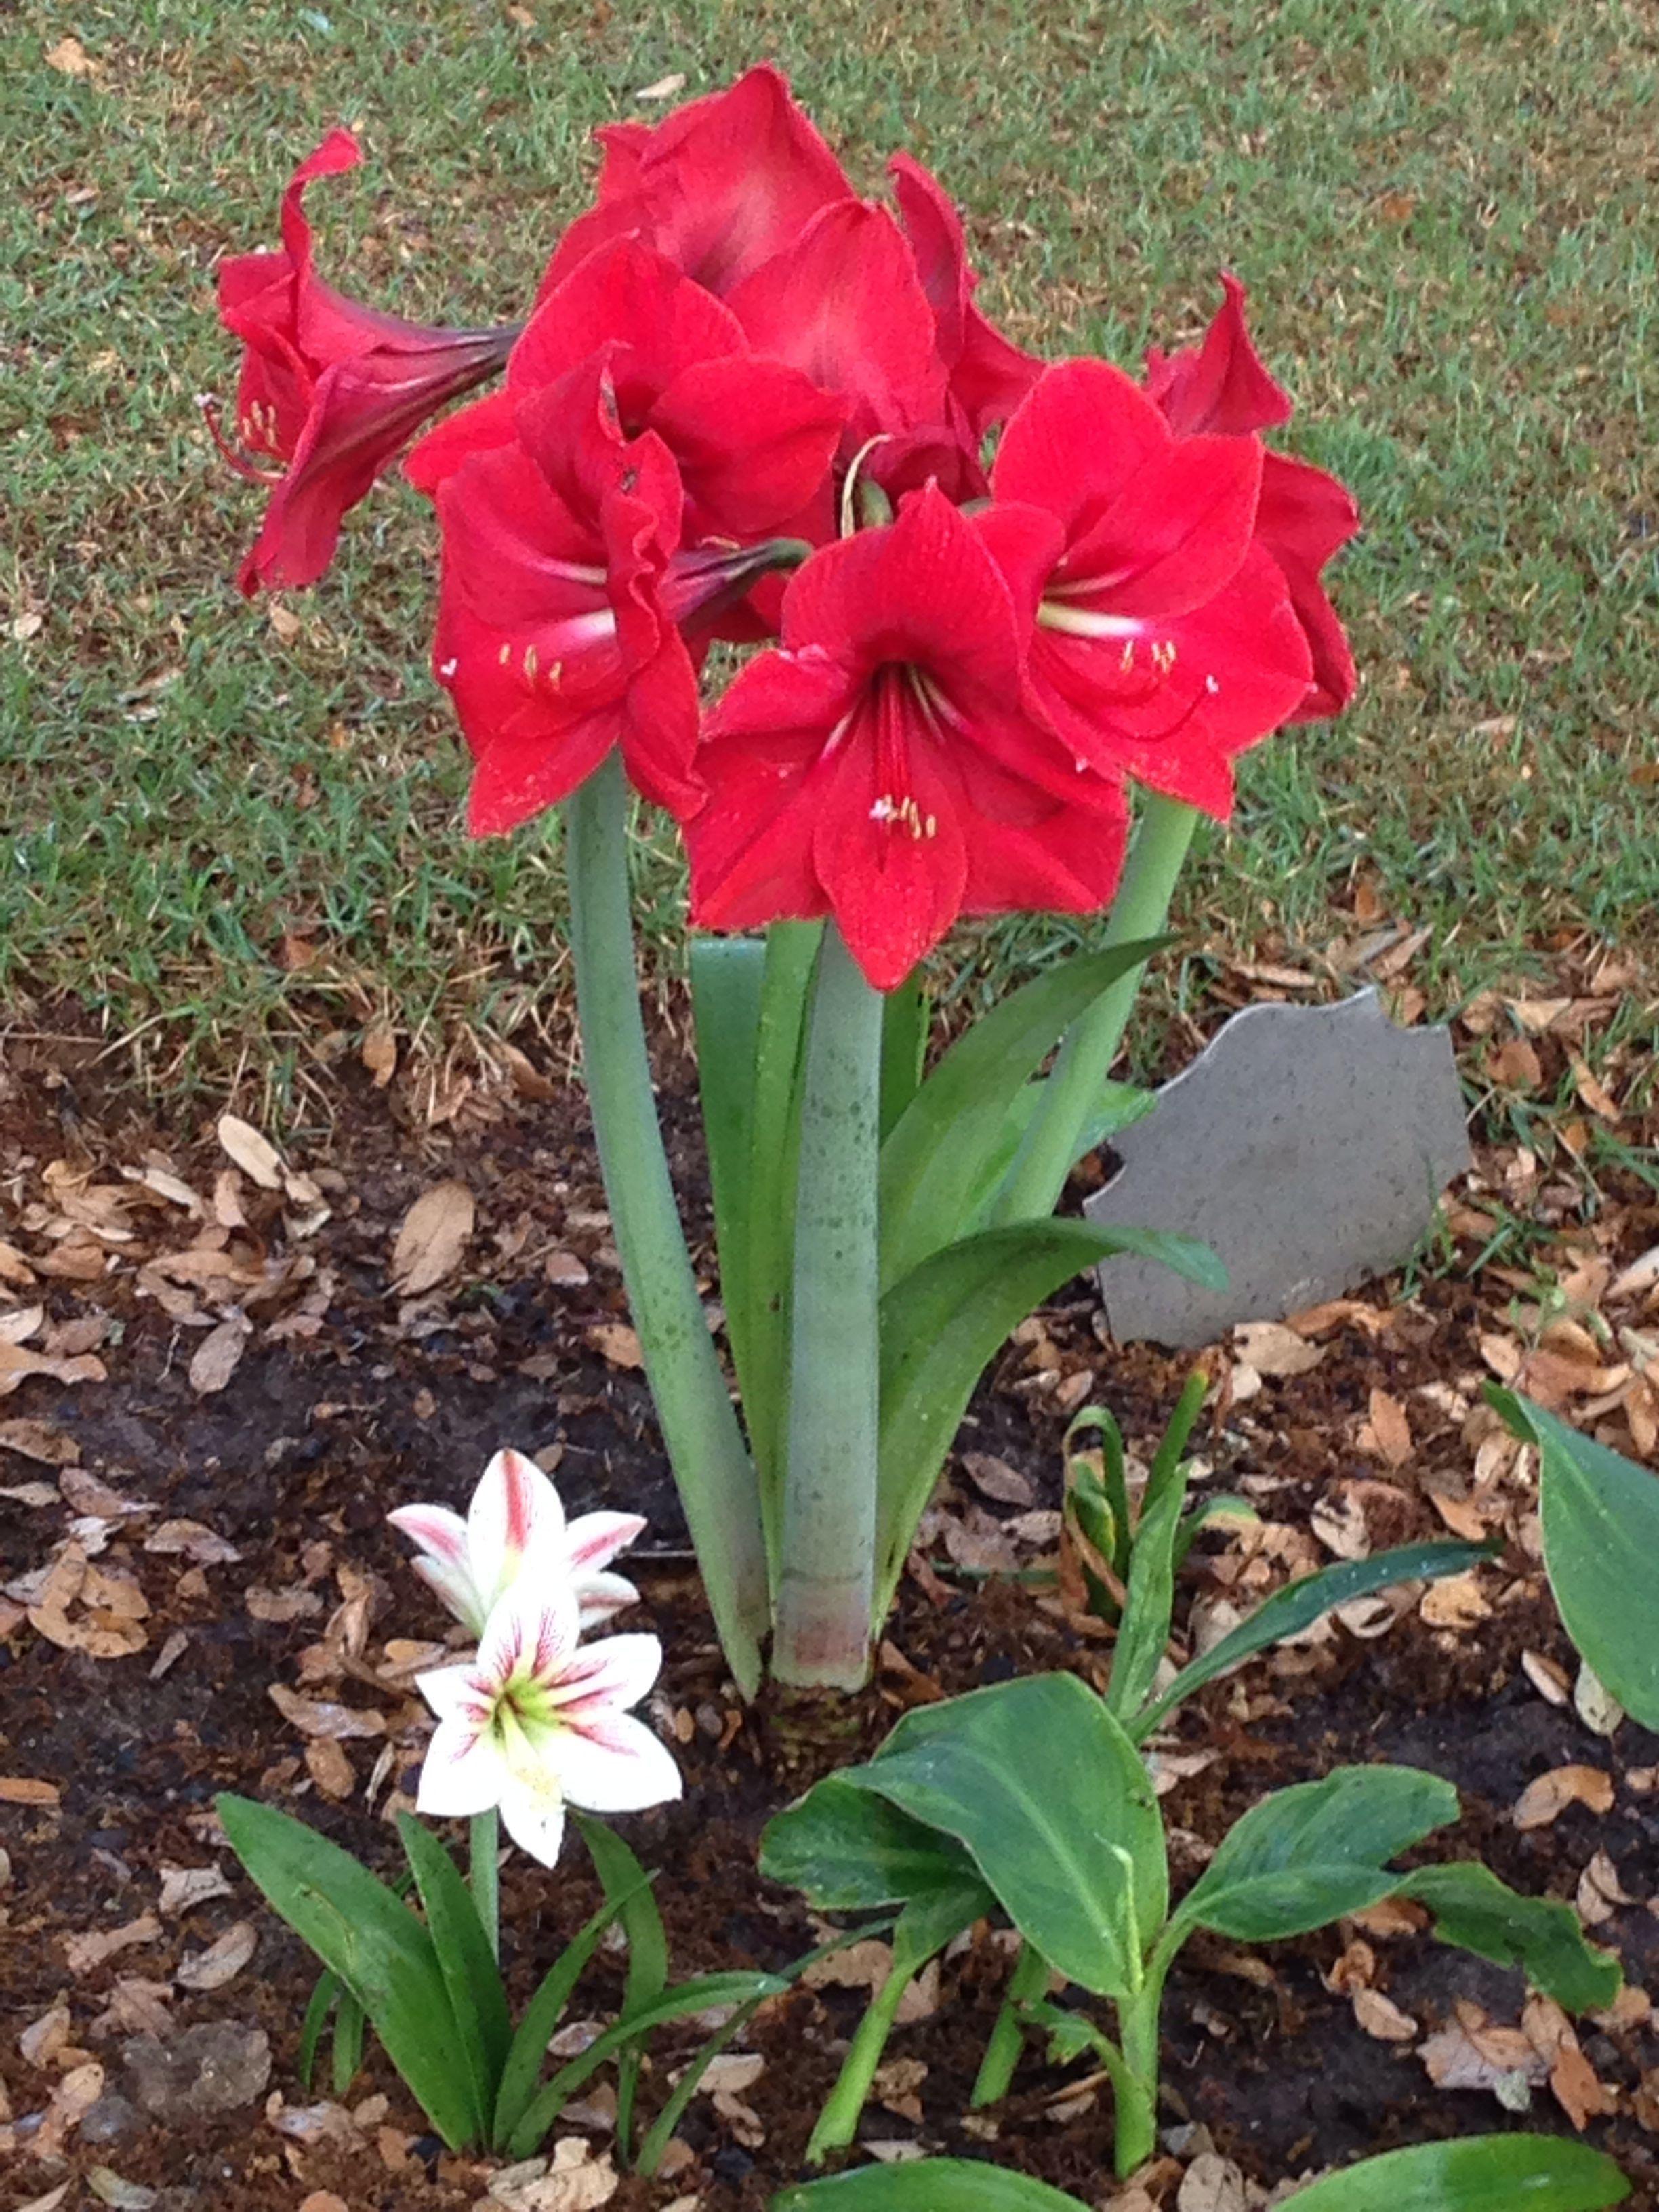 Red Lion Amaryllis In My Garden April 2014 Beau Jardin Amaryllisdeko Flores Bonitas Flores Lirios